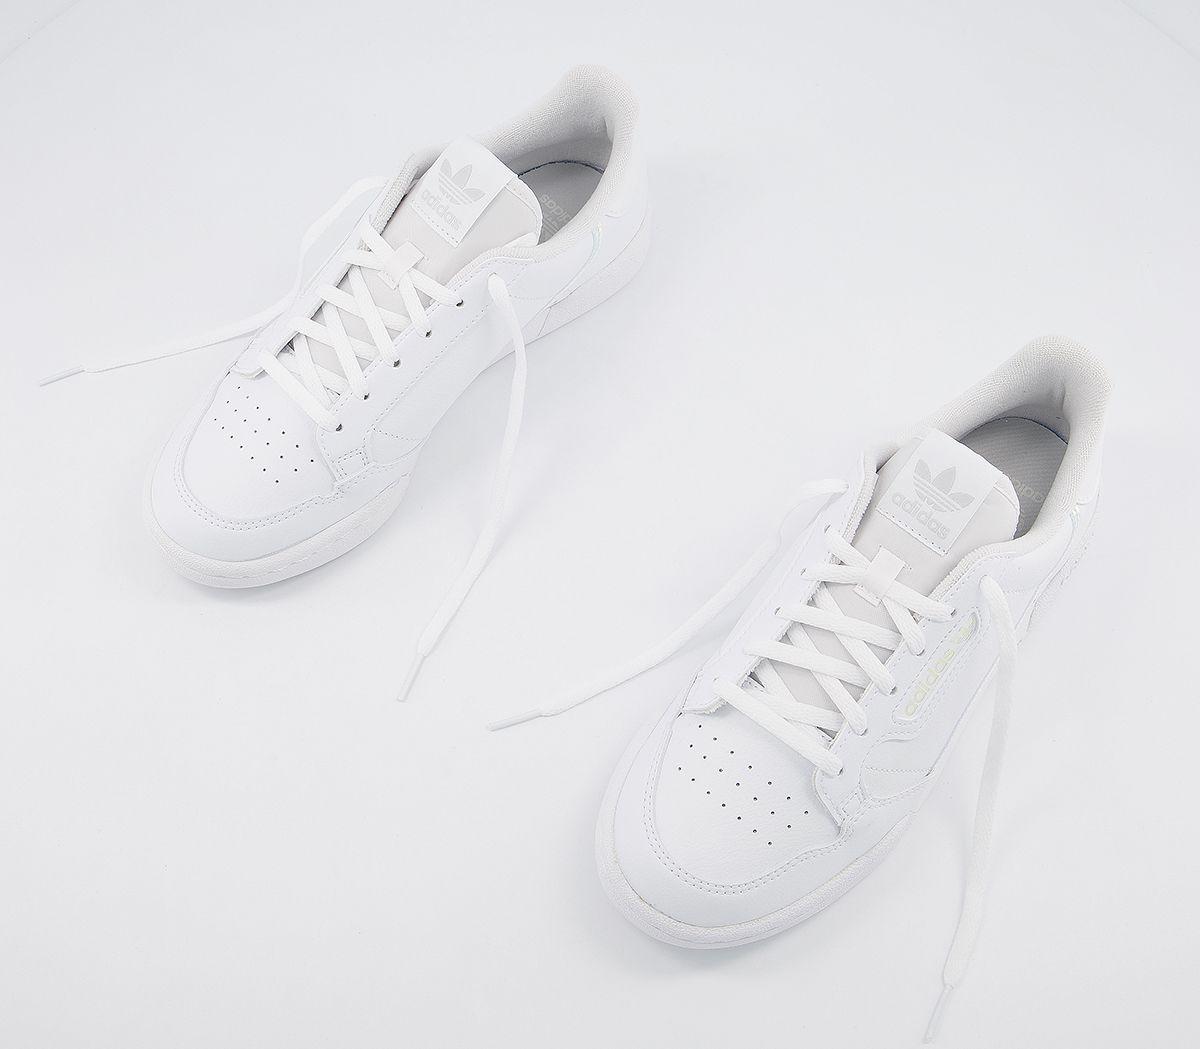 Bambini-Adidas-Continental-anni-039-80-JNR-Scarpe-da-ginnastica-bianco-iridescente-Kids miniatura 14